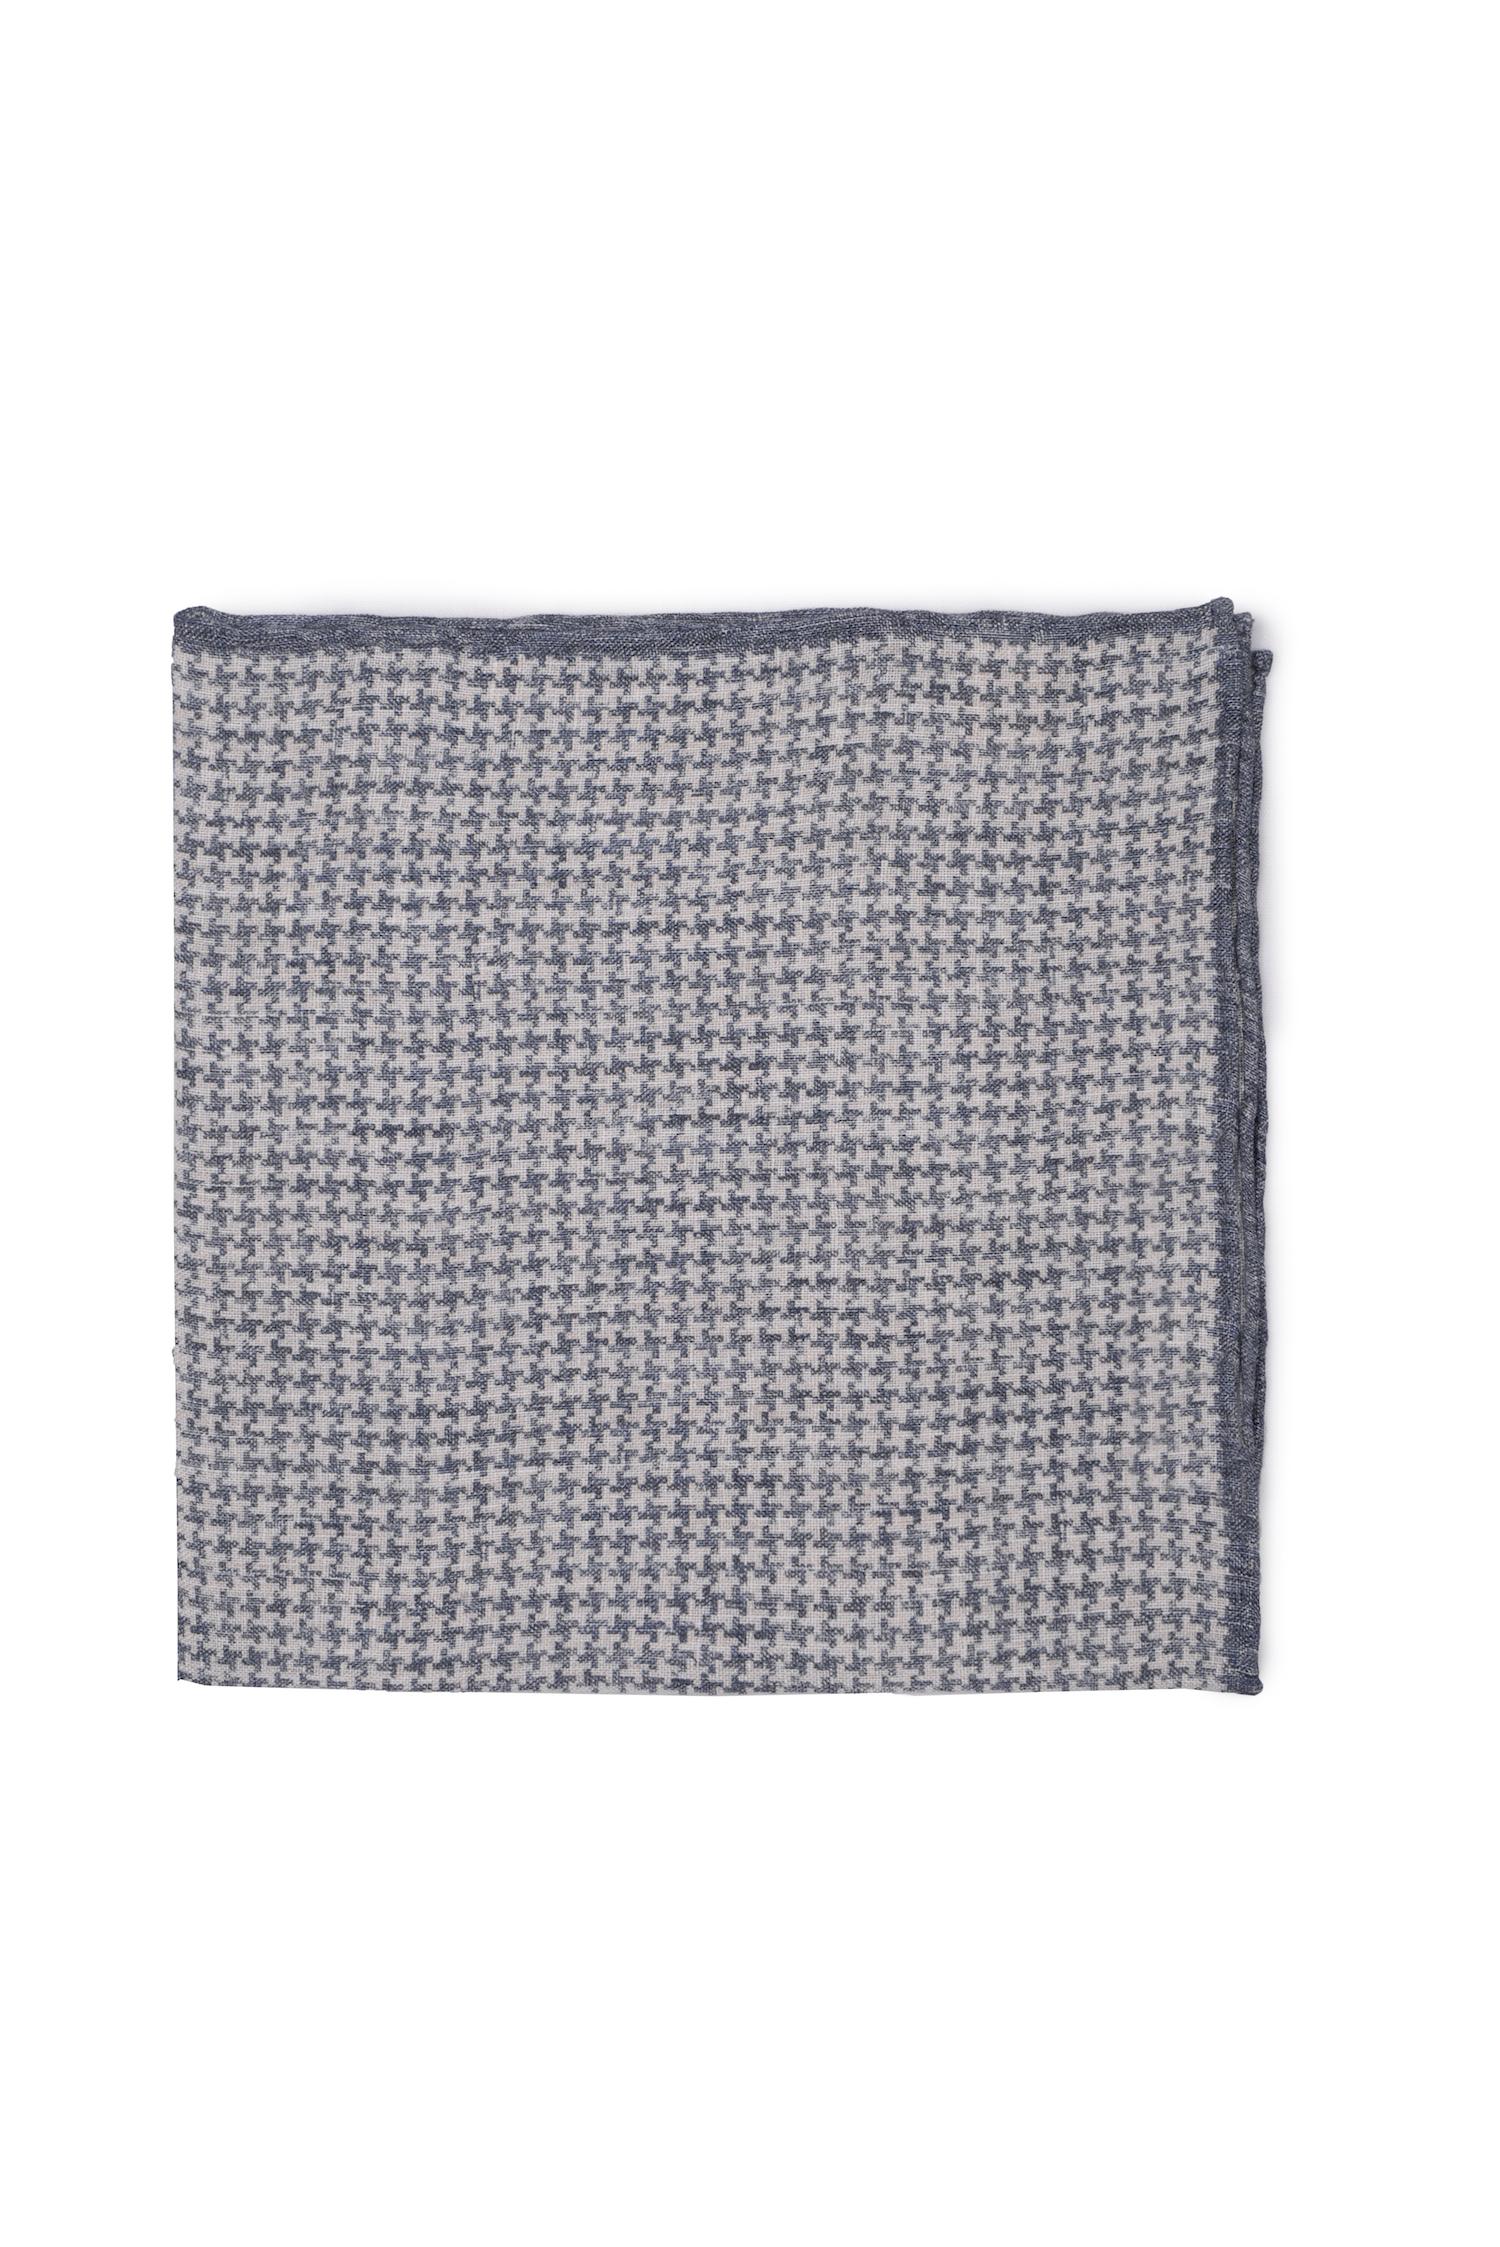 Pochette motif pied-de-poule en lin – indigo   Cadot 92e99f6cfff